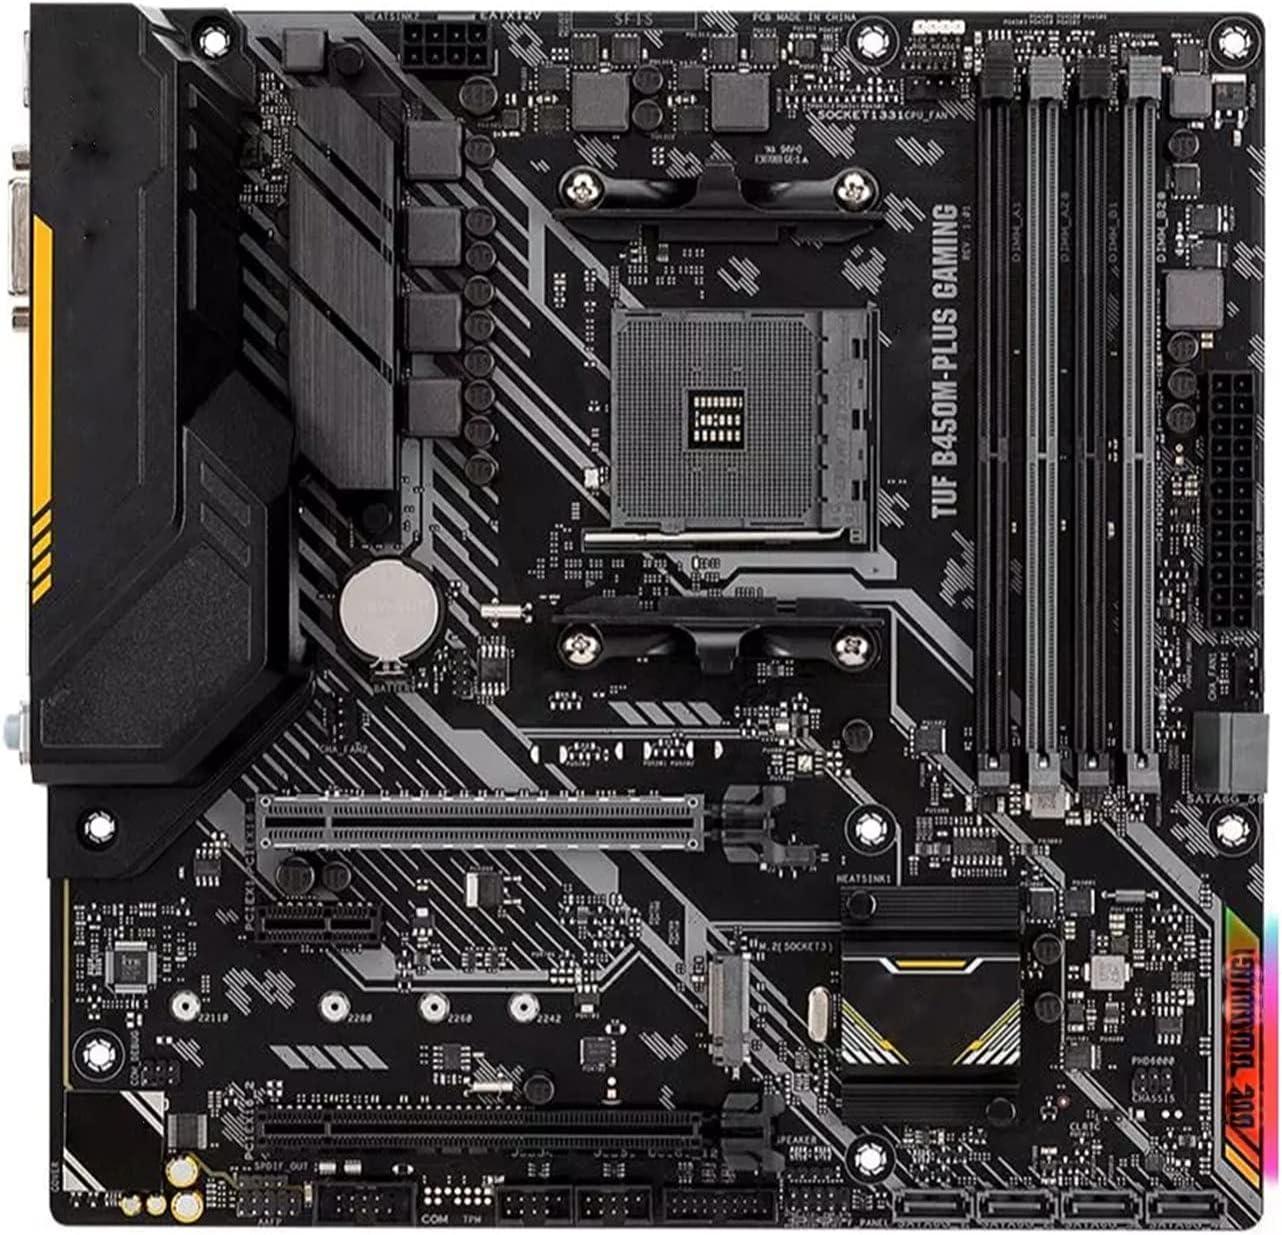 SYFANG Fit for ASUS TUF B450M-PLUS Gaming Placa Base DDR4 M.2 AMD Ryzen Desktop B450 AM4 Placa Base de computadora(Color:A)